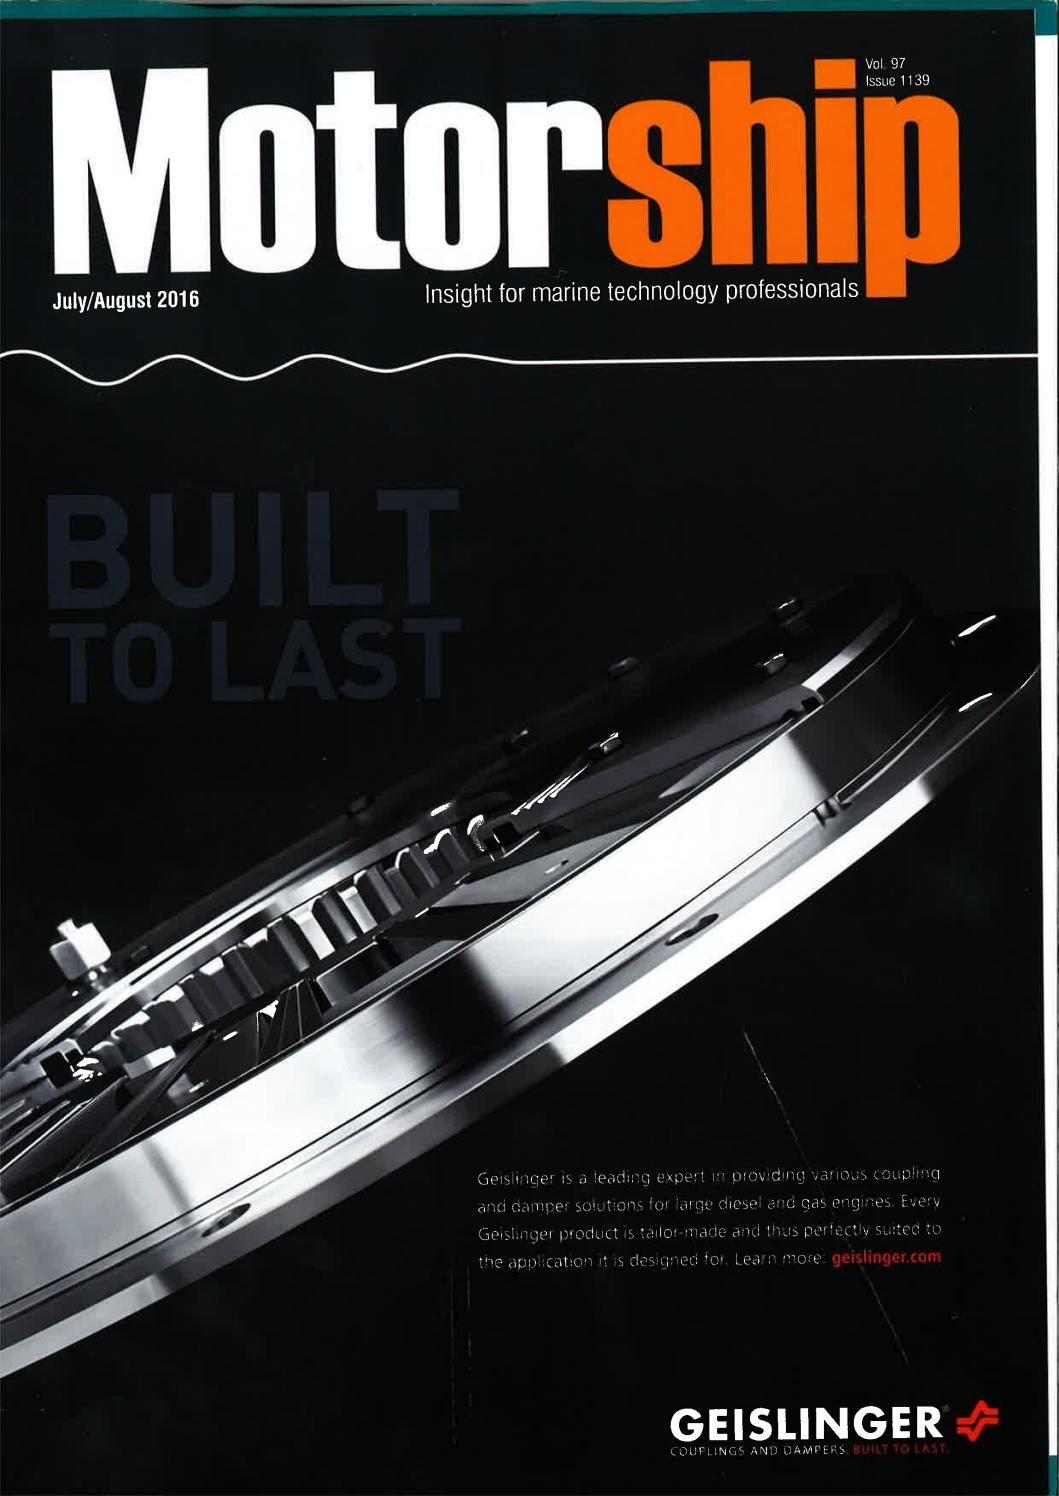 Motorship (Jul-Aug. 2016)